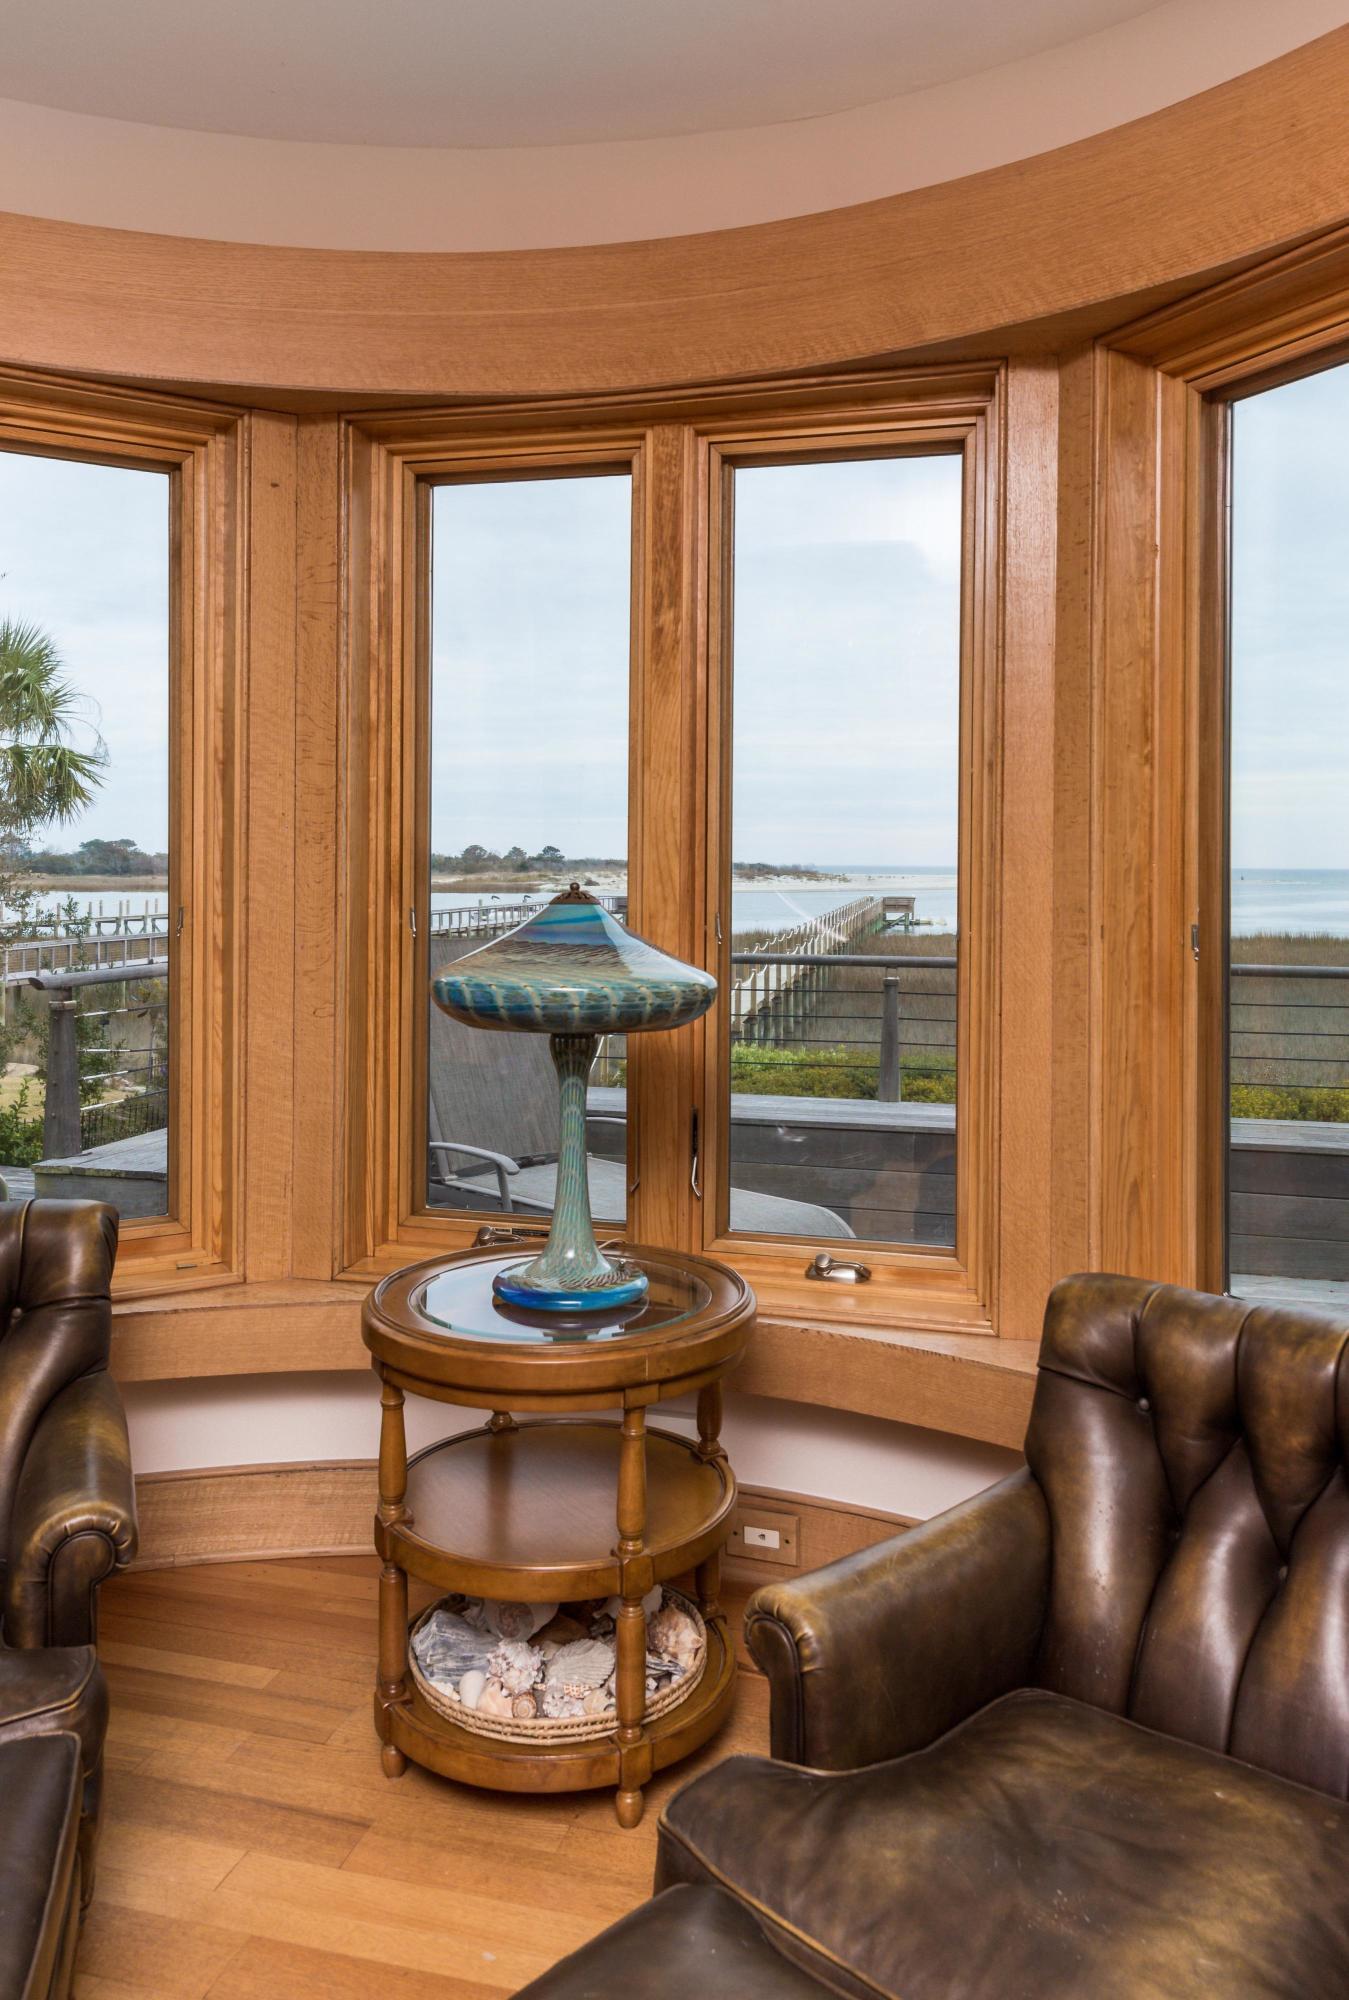 Seabrook Island Homes For Sale - 3087 Marshgate, Seabrook Island, SC - 41